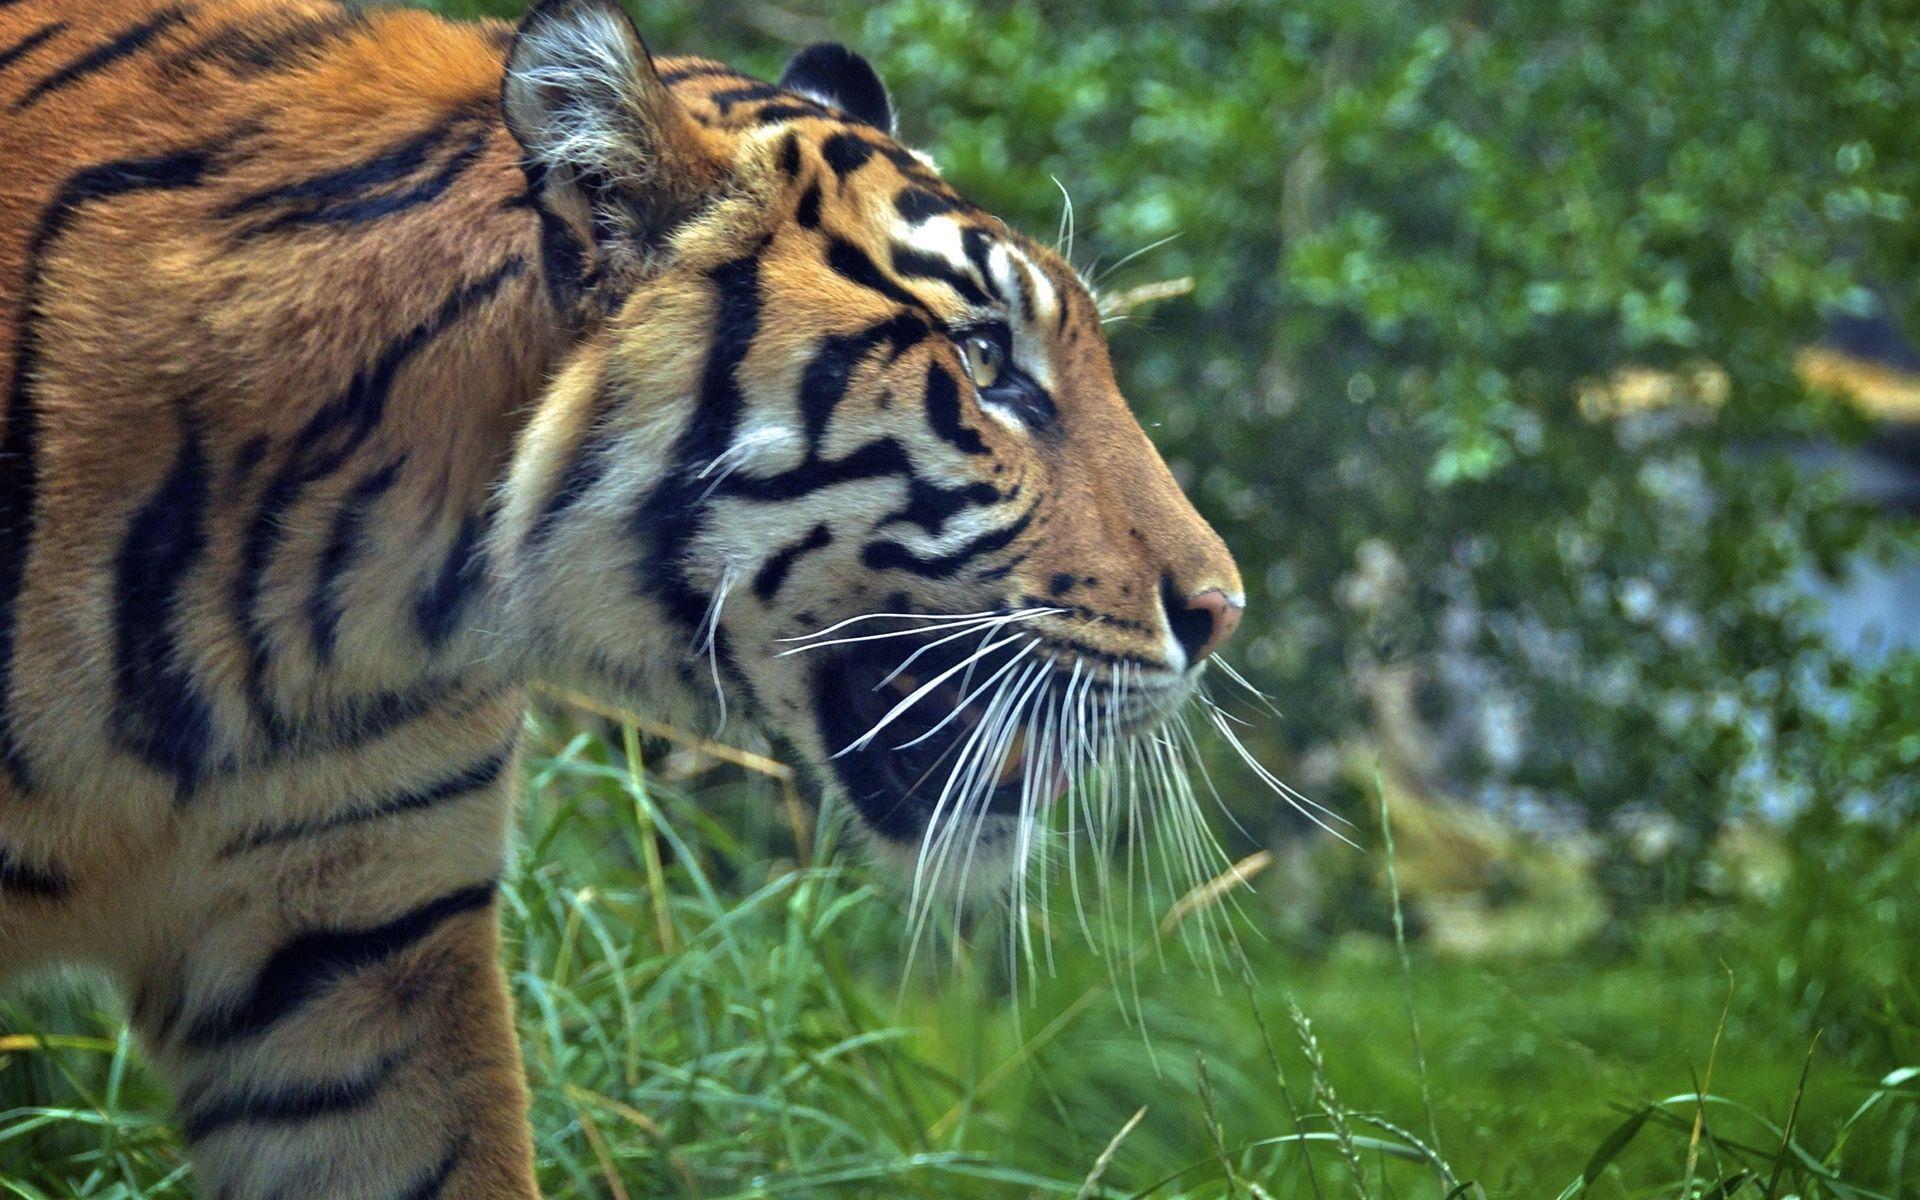 Tiger, New Wallpaper